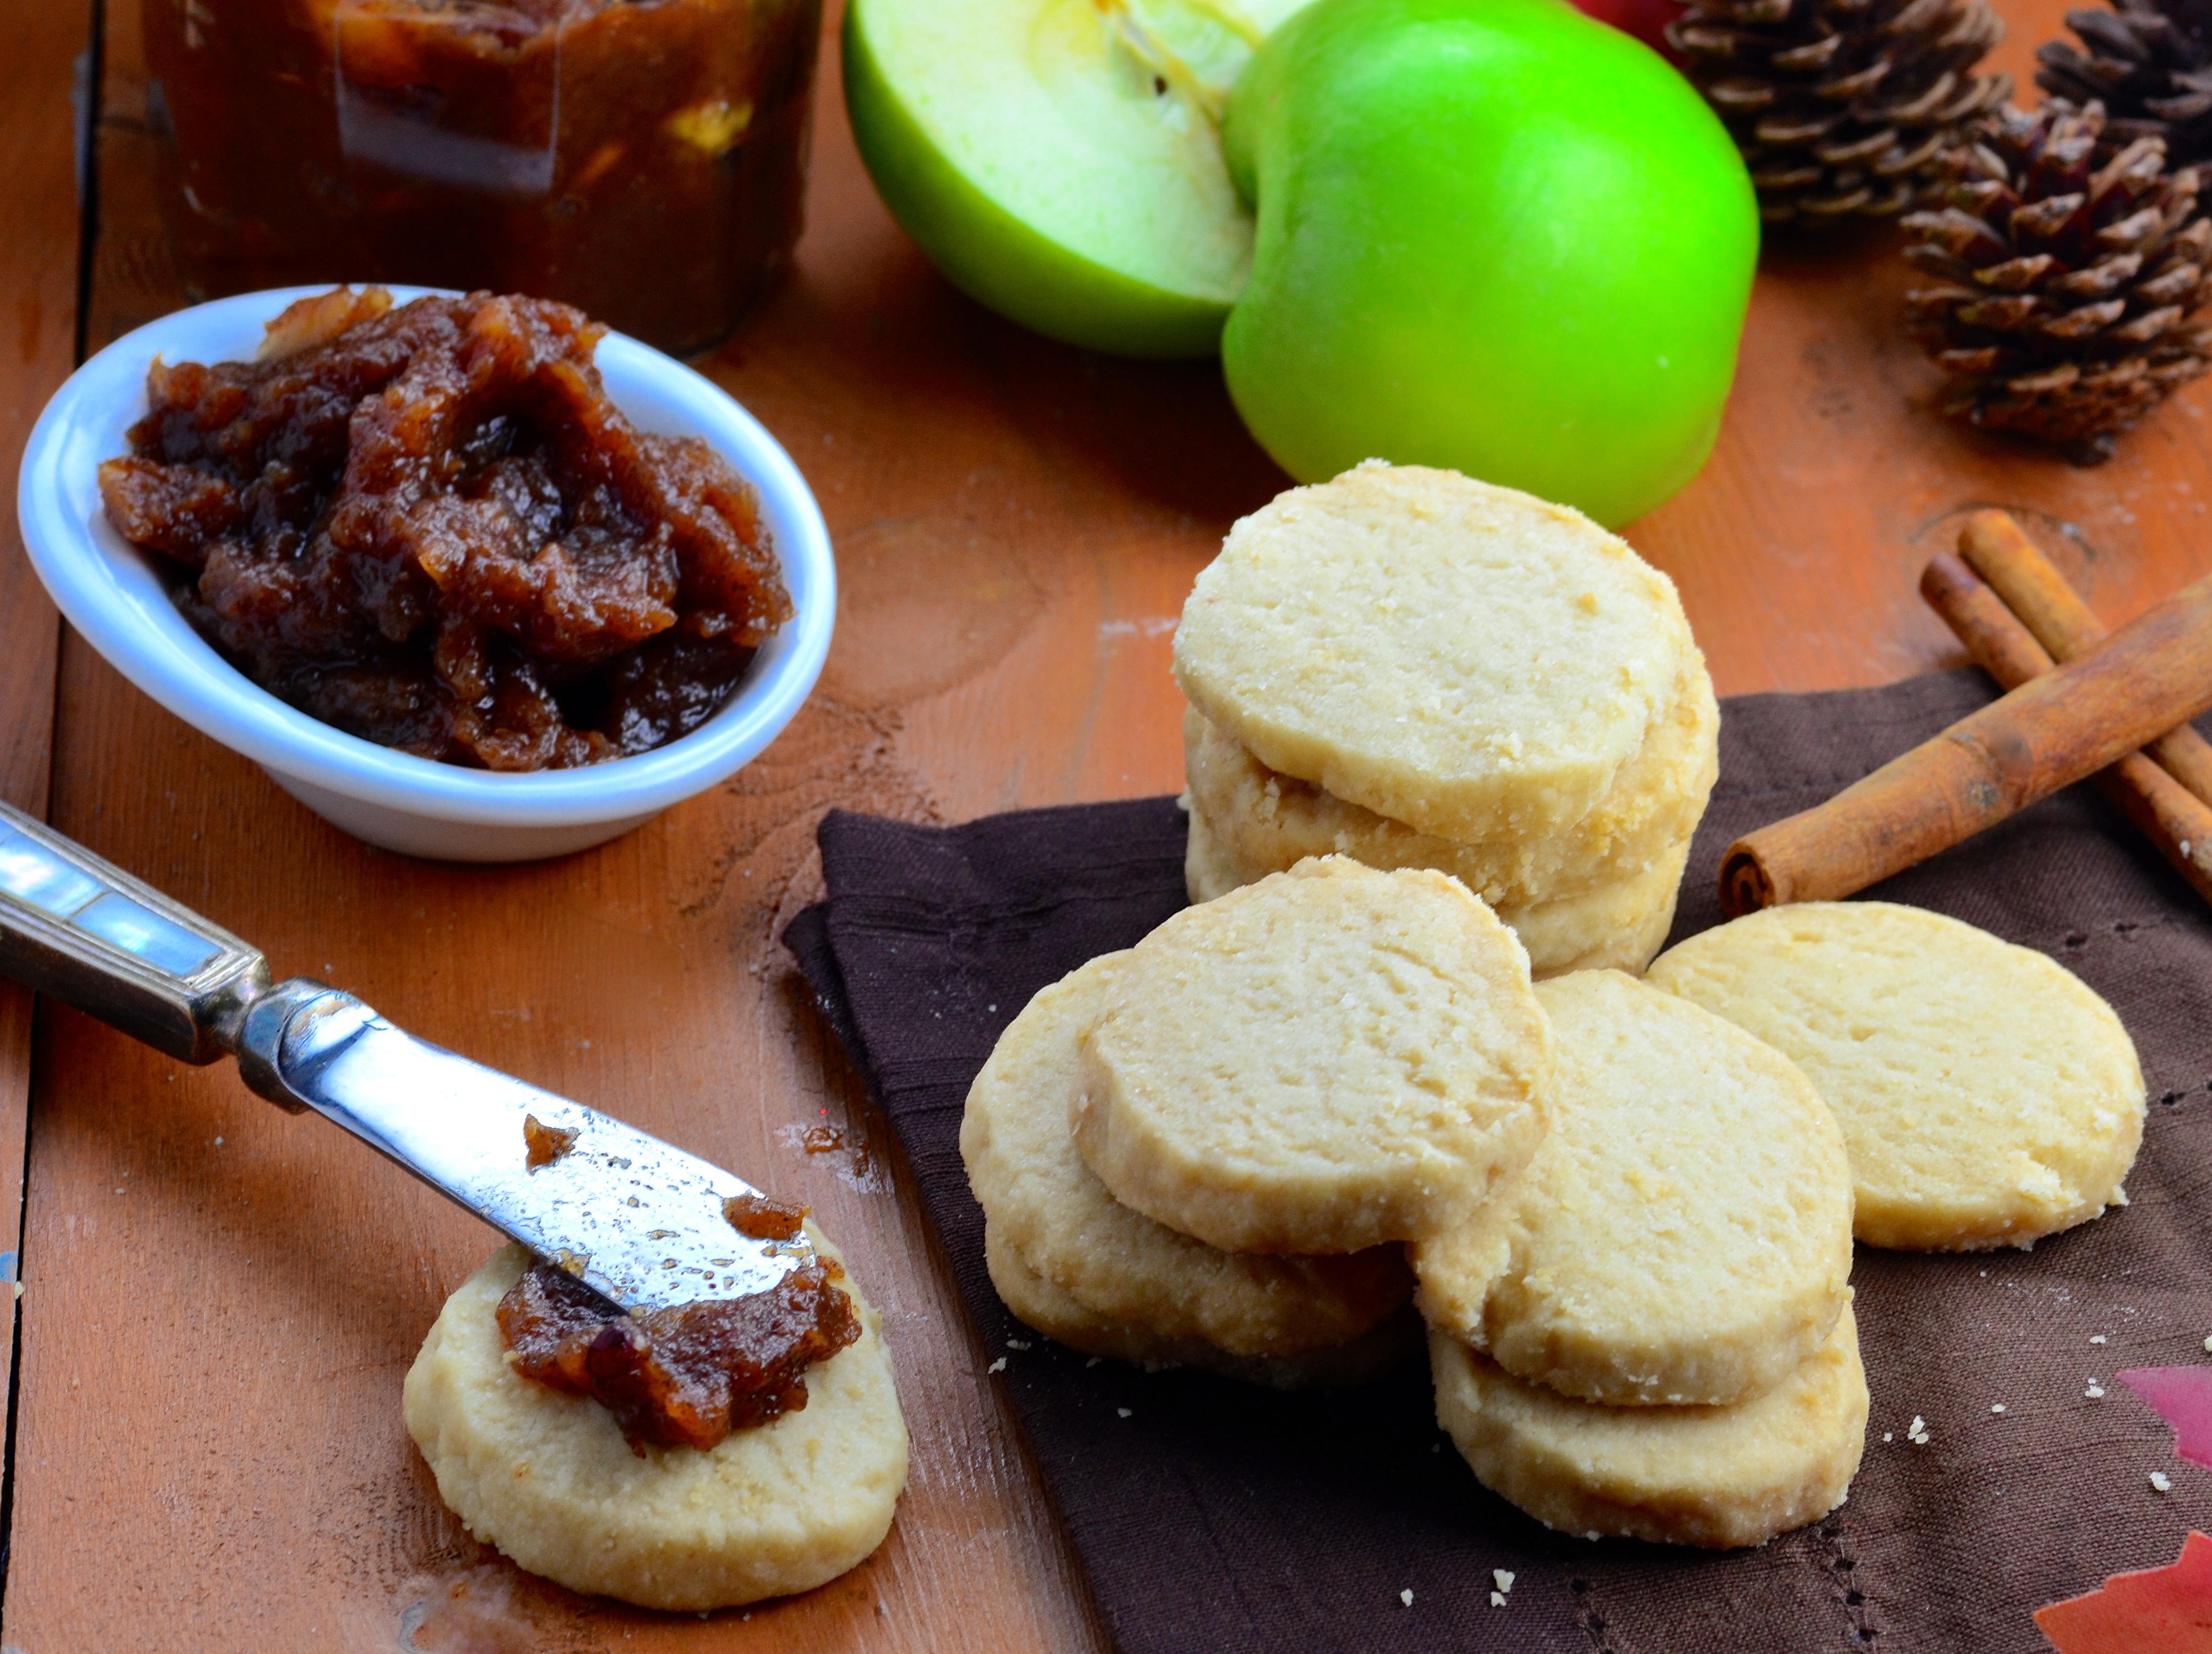 Vegan Shortbread & Spiced Apple Butter